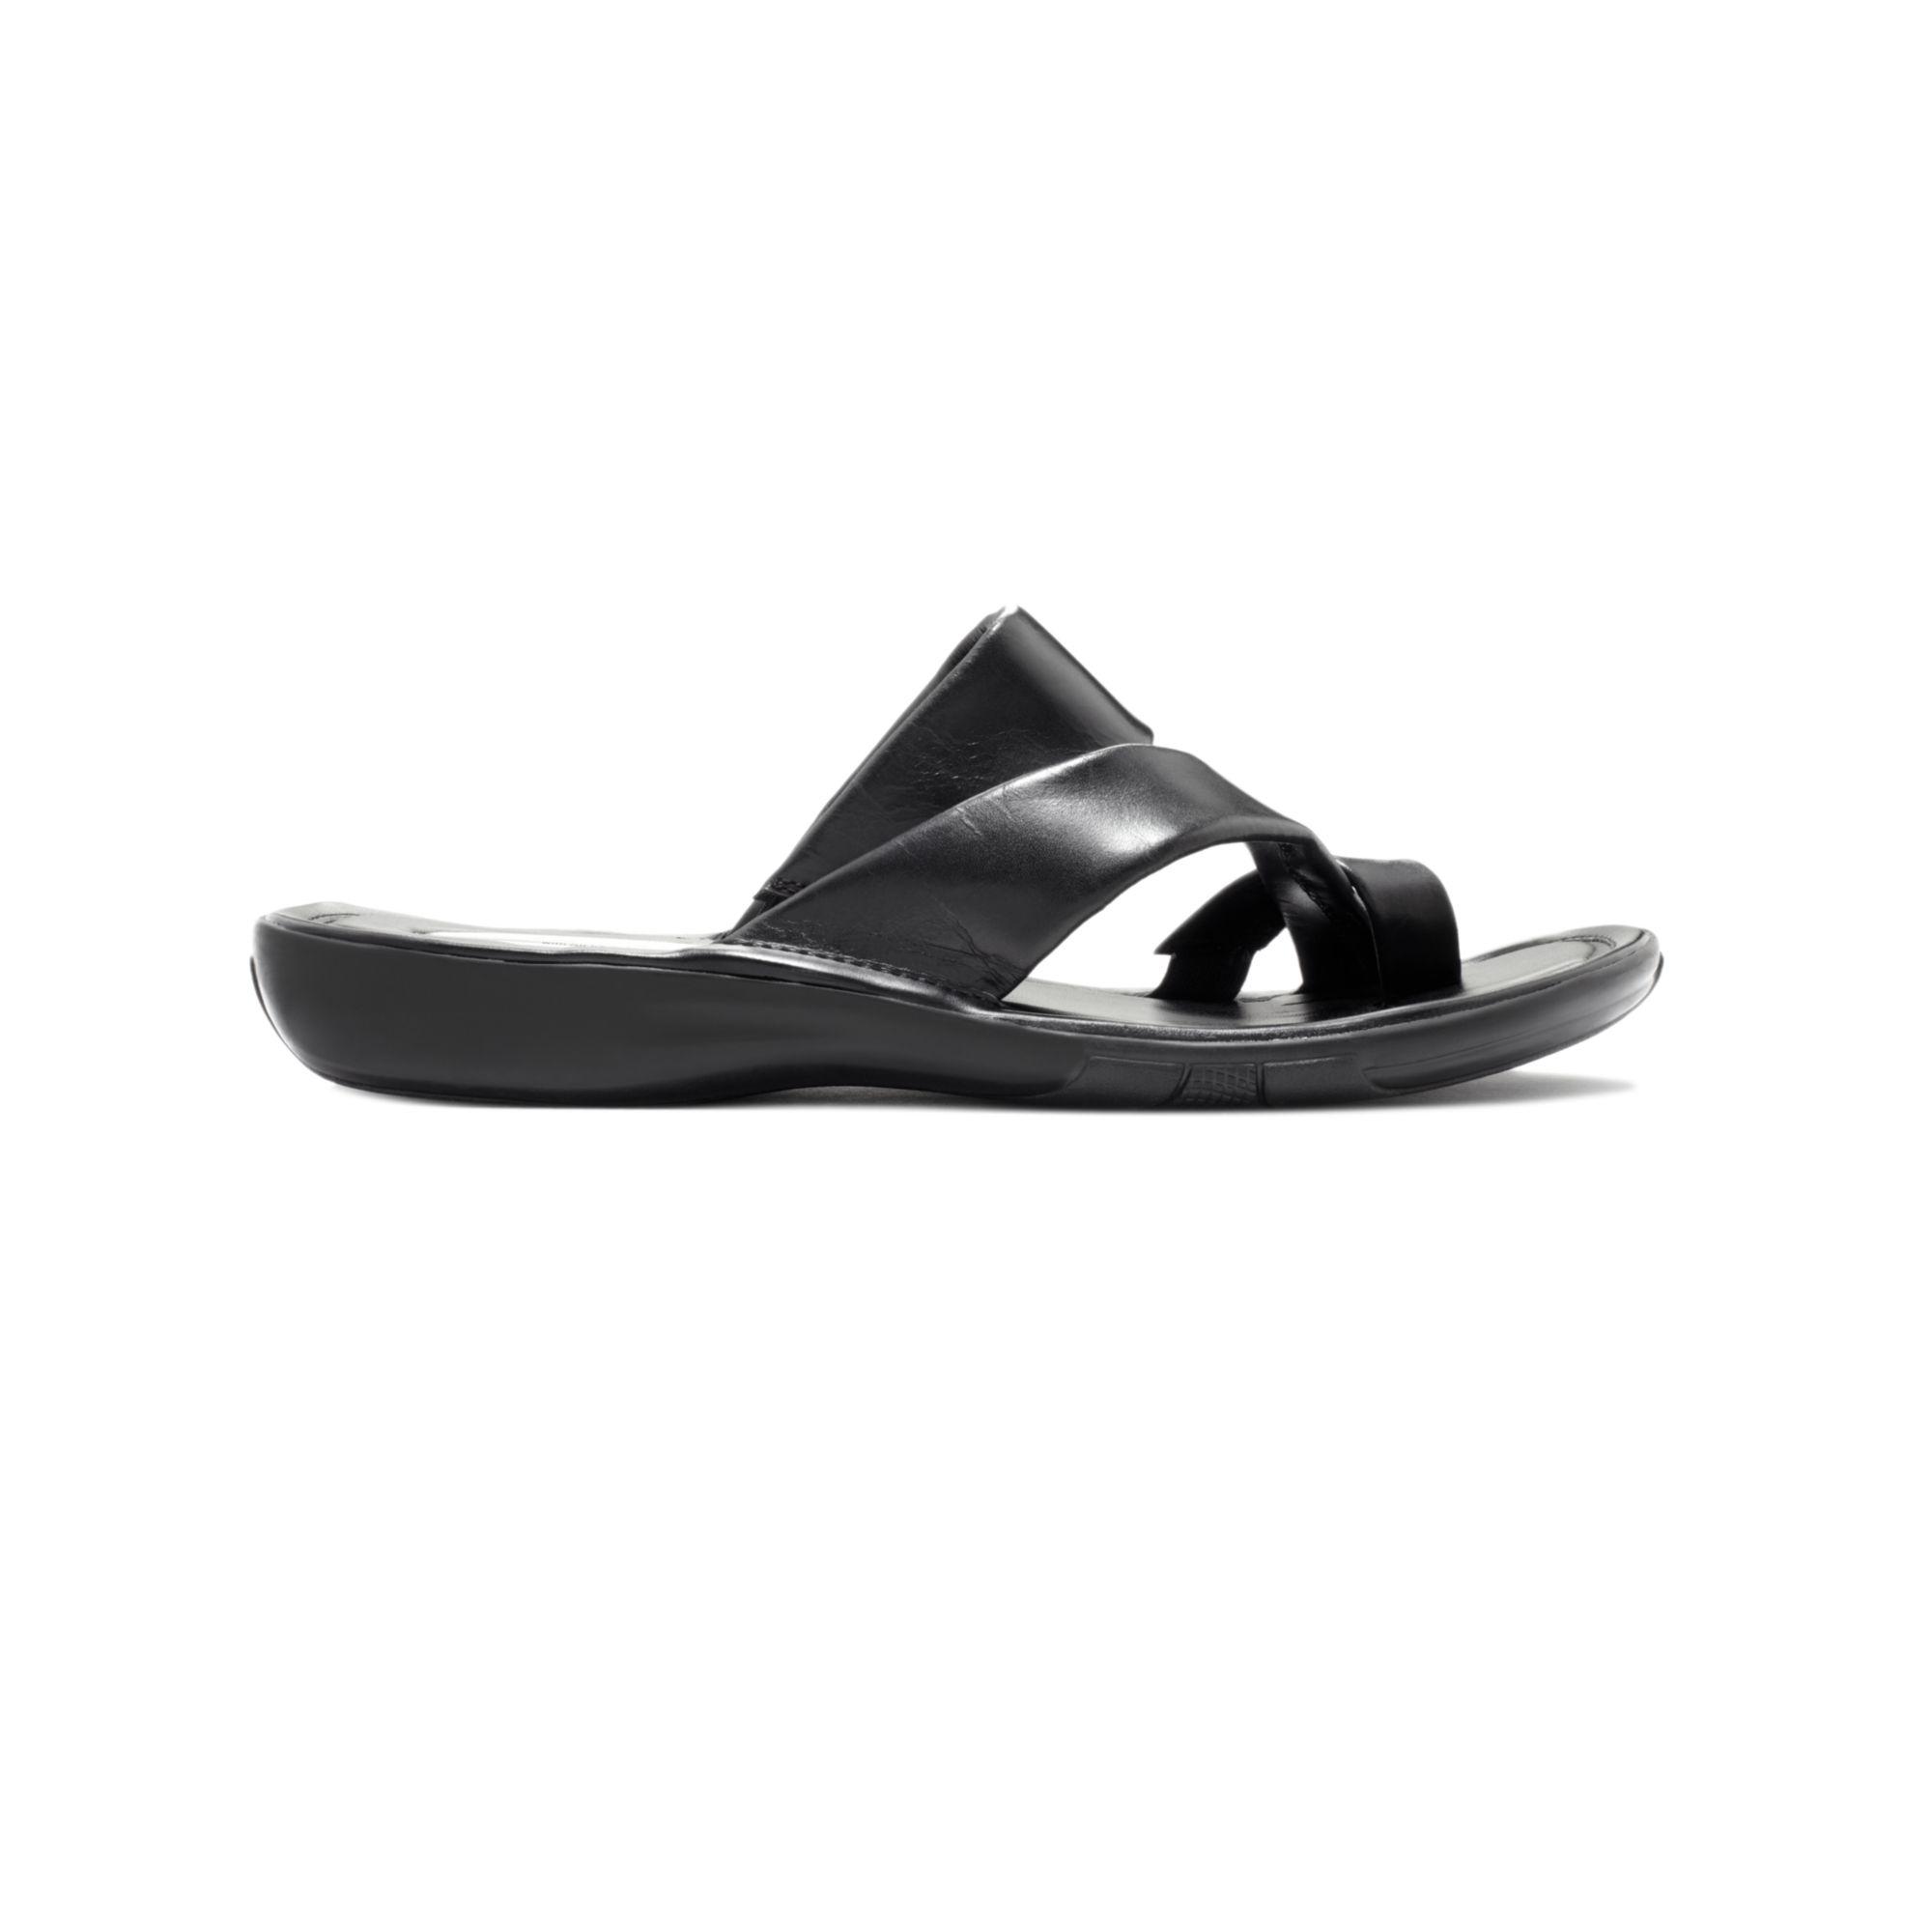 2a70f9cfffbd Lyst - Kenneth Cole Morning Stretch with Silver Technology Sandals ...